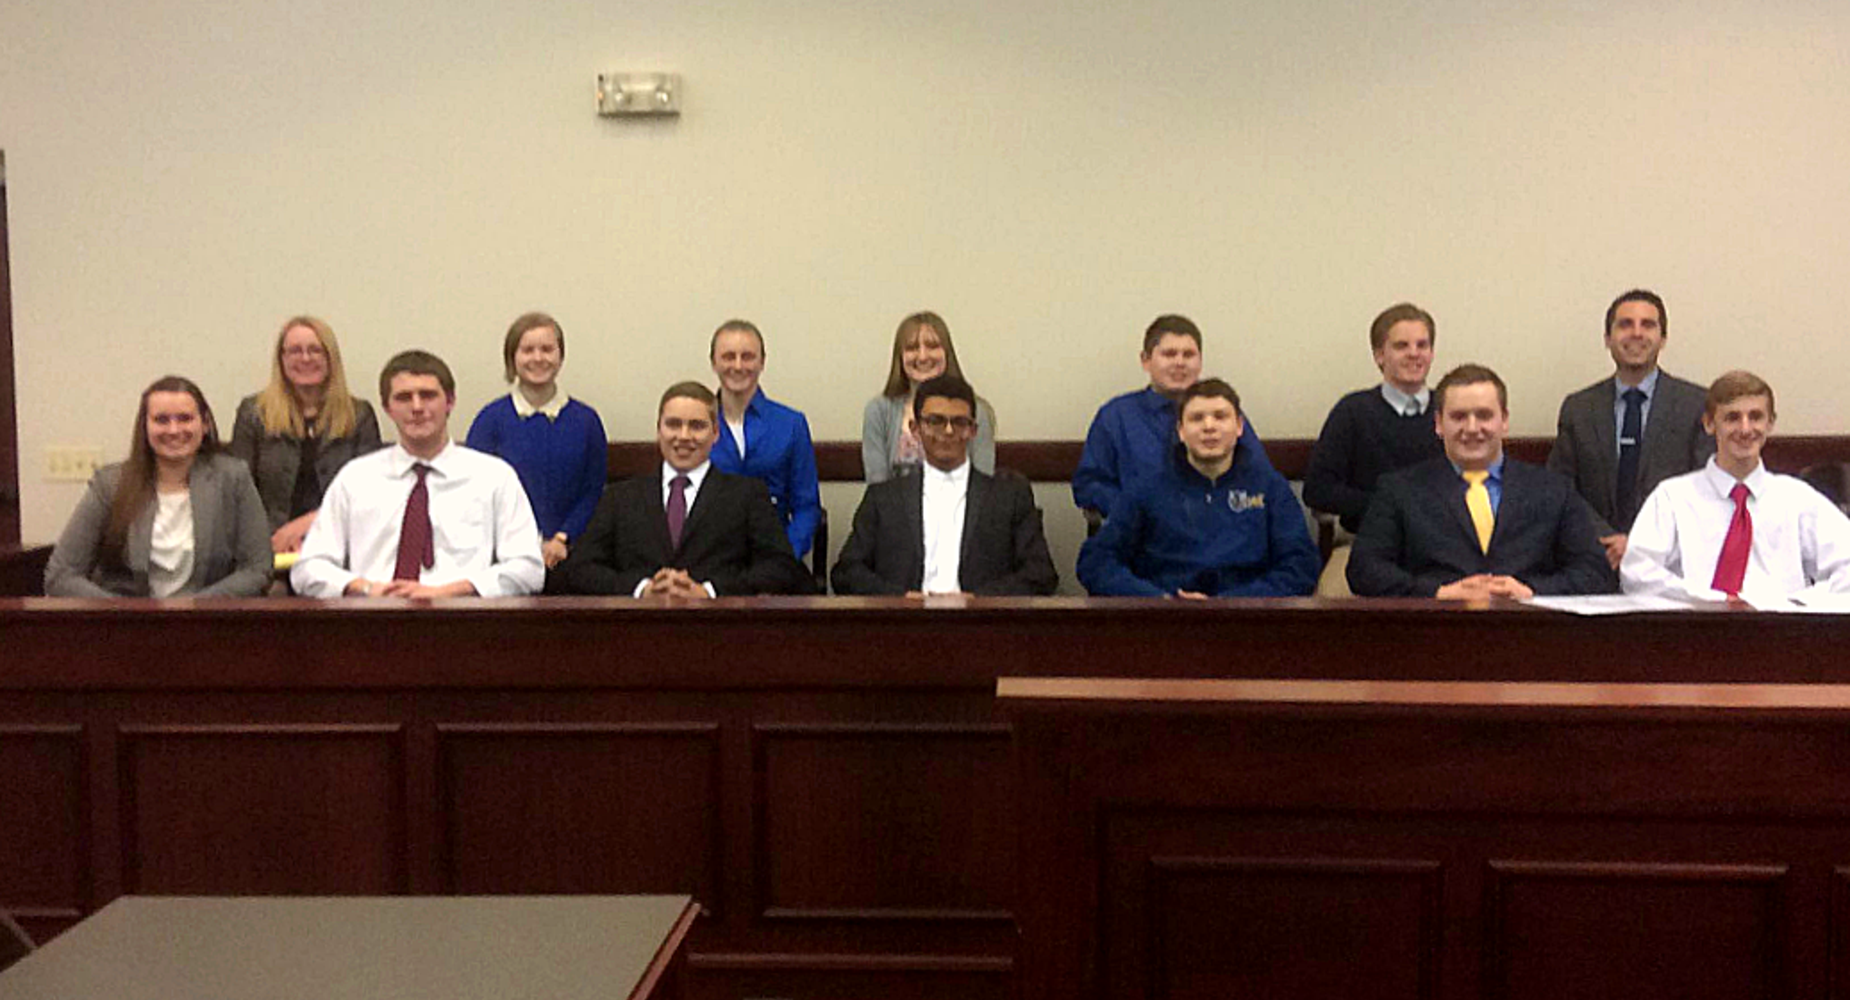 Mock Trial Team in Courtroom Jury Box